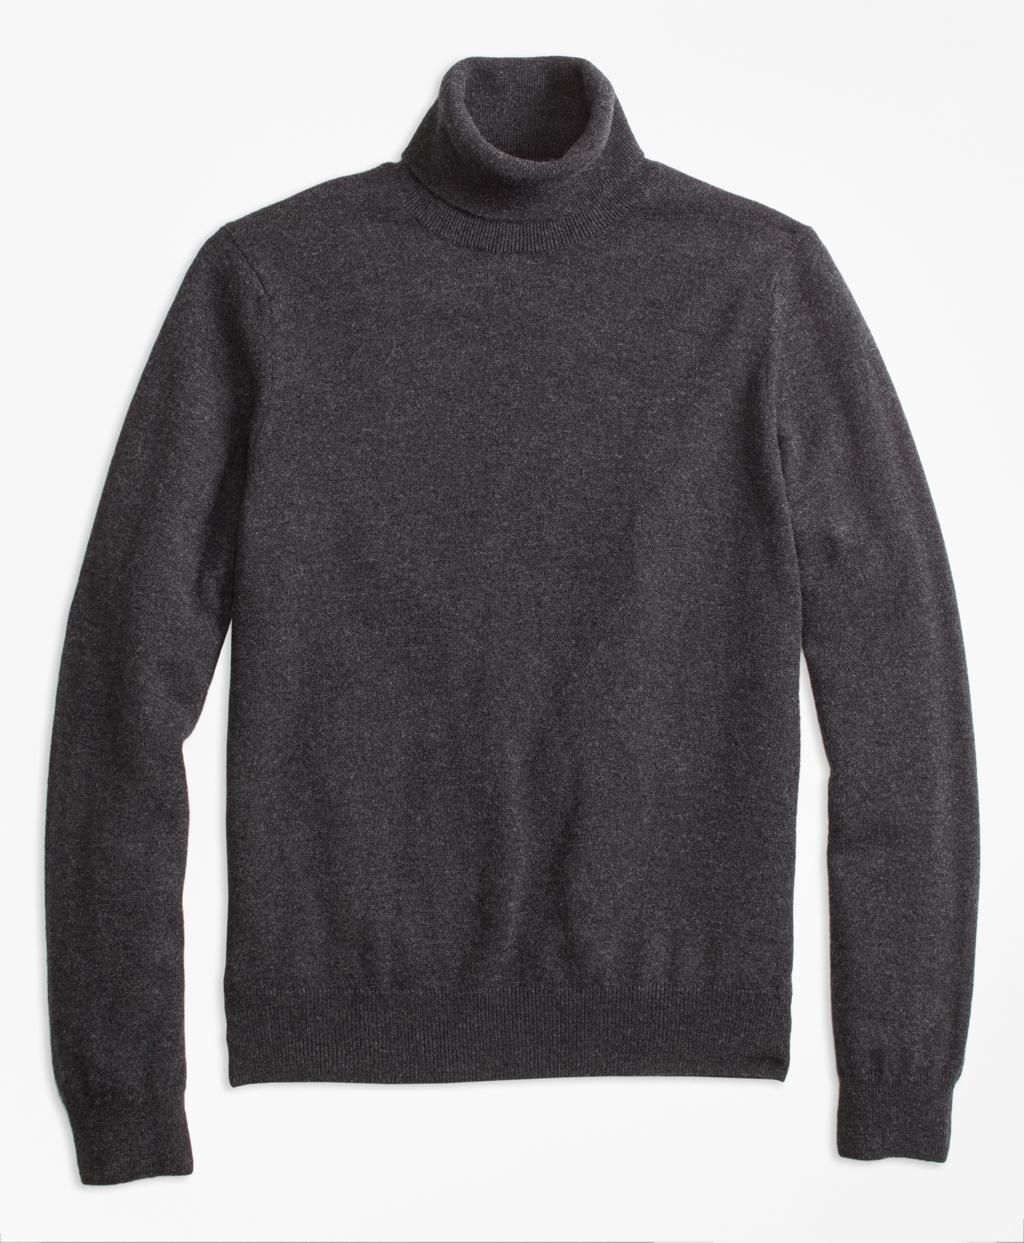 Men's Vintage Sweaters – 1920s to 1960s Retro Jumpers Brooks Brothers Mens Turtleneck Cashmere Sweater $298.00 AT vintagedancer.com